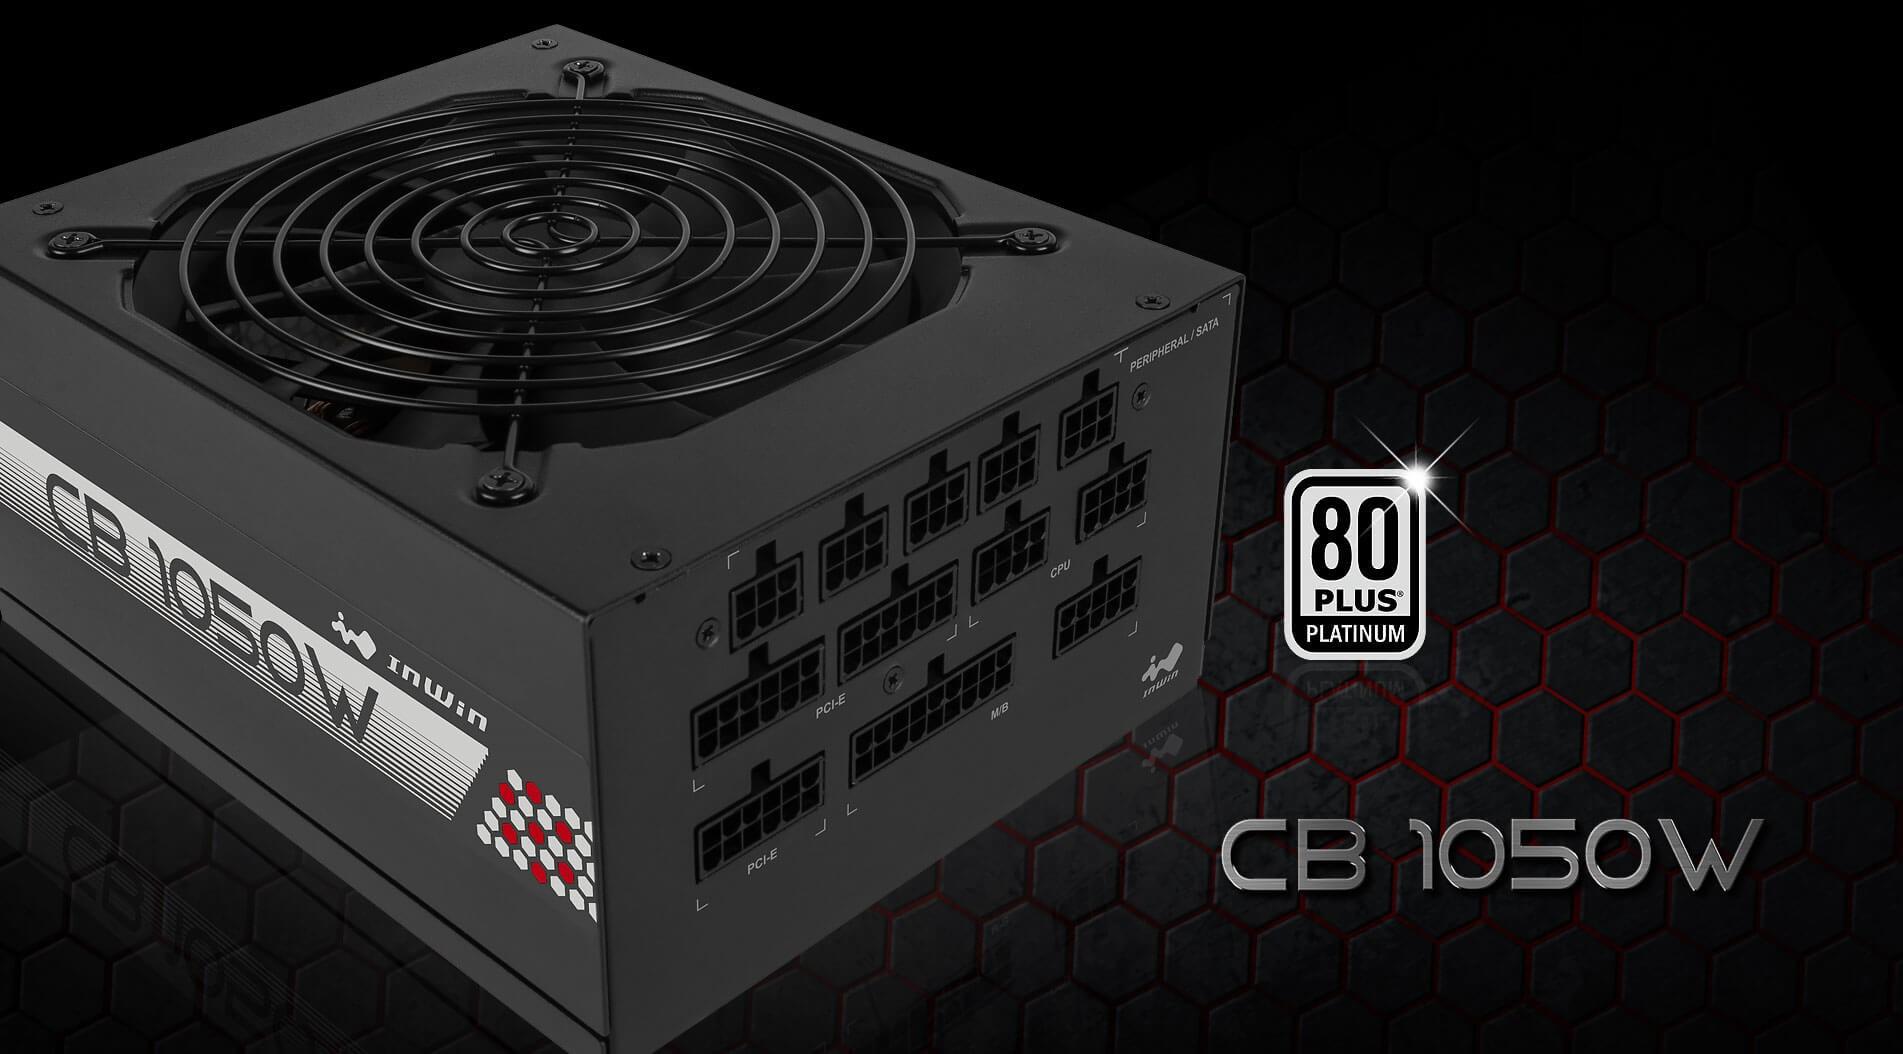 CB-1050